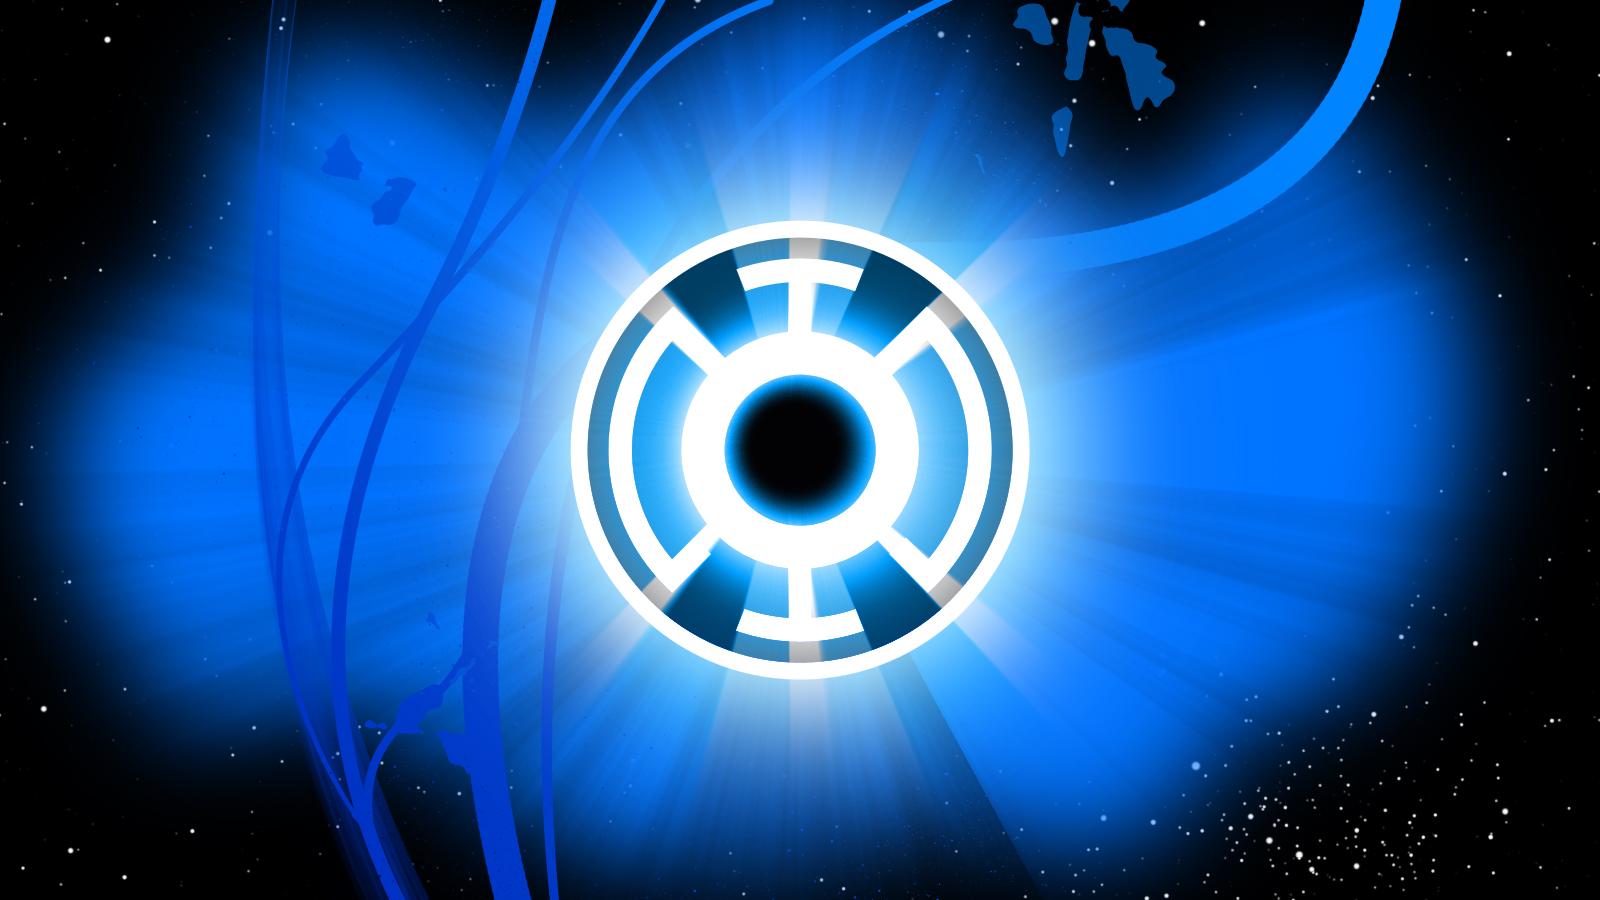 Blue Lantern Corp Logo 1600x900 Download Hd Wallpaper Wallpapertip